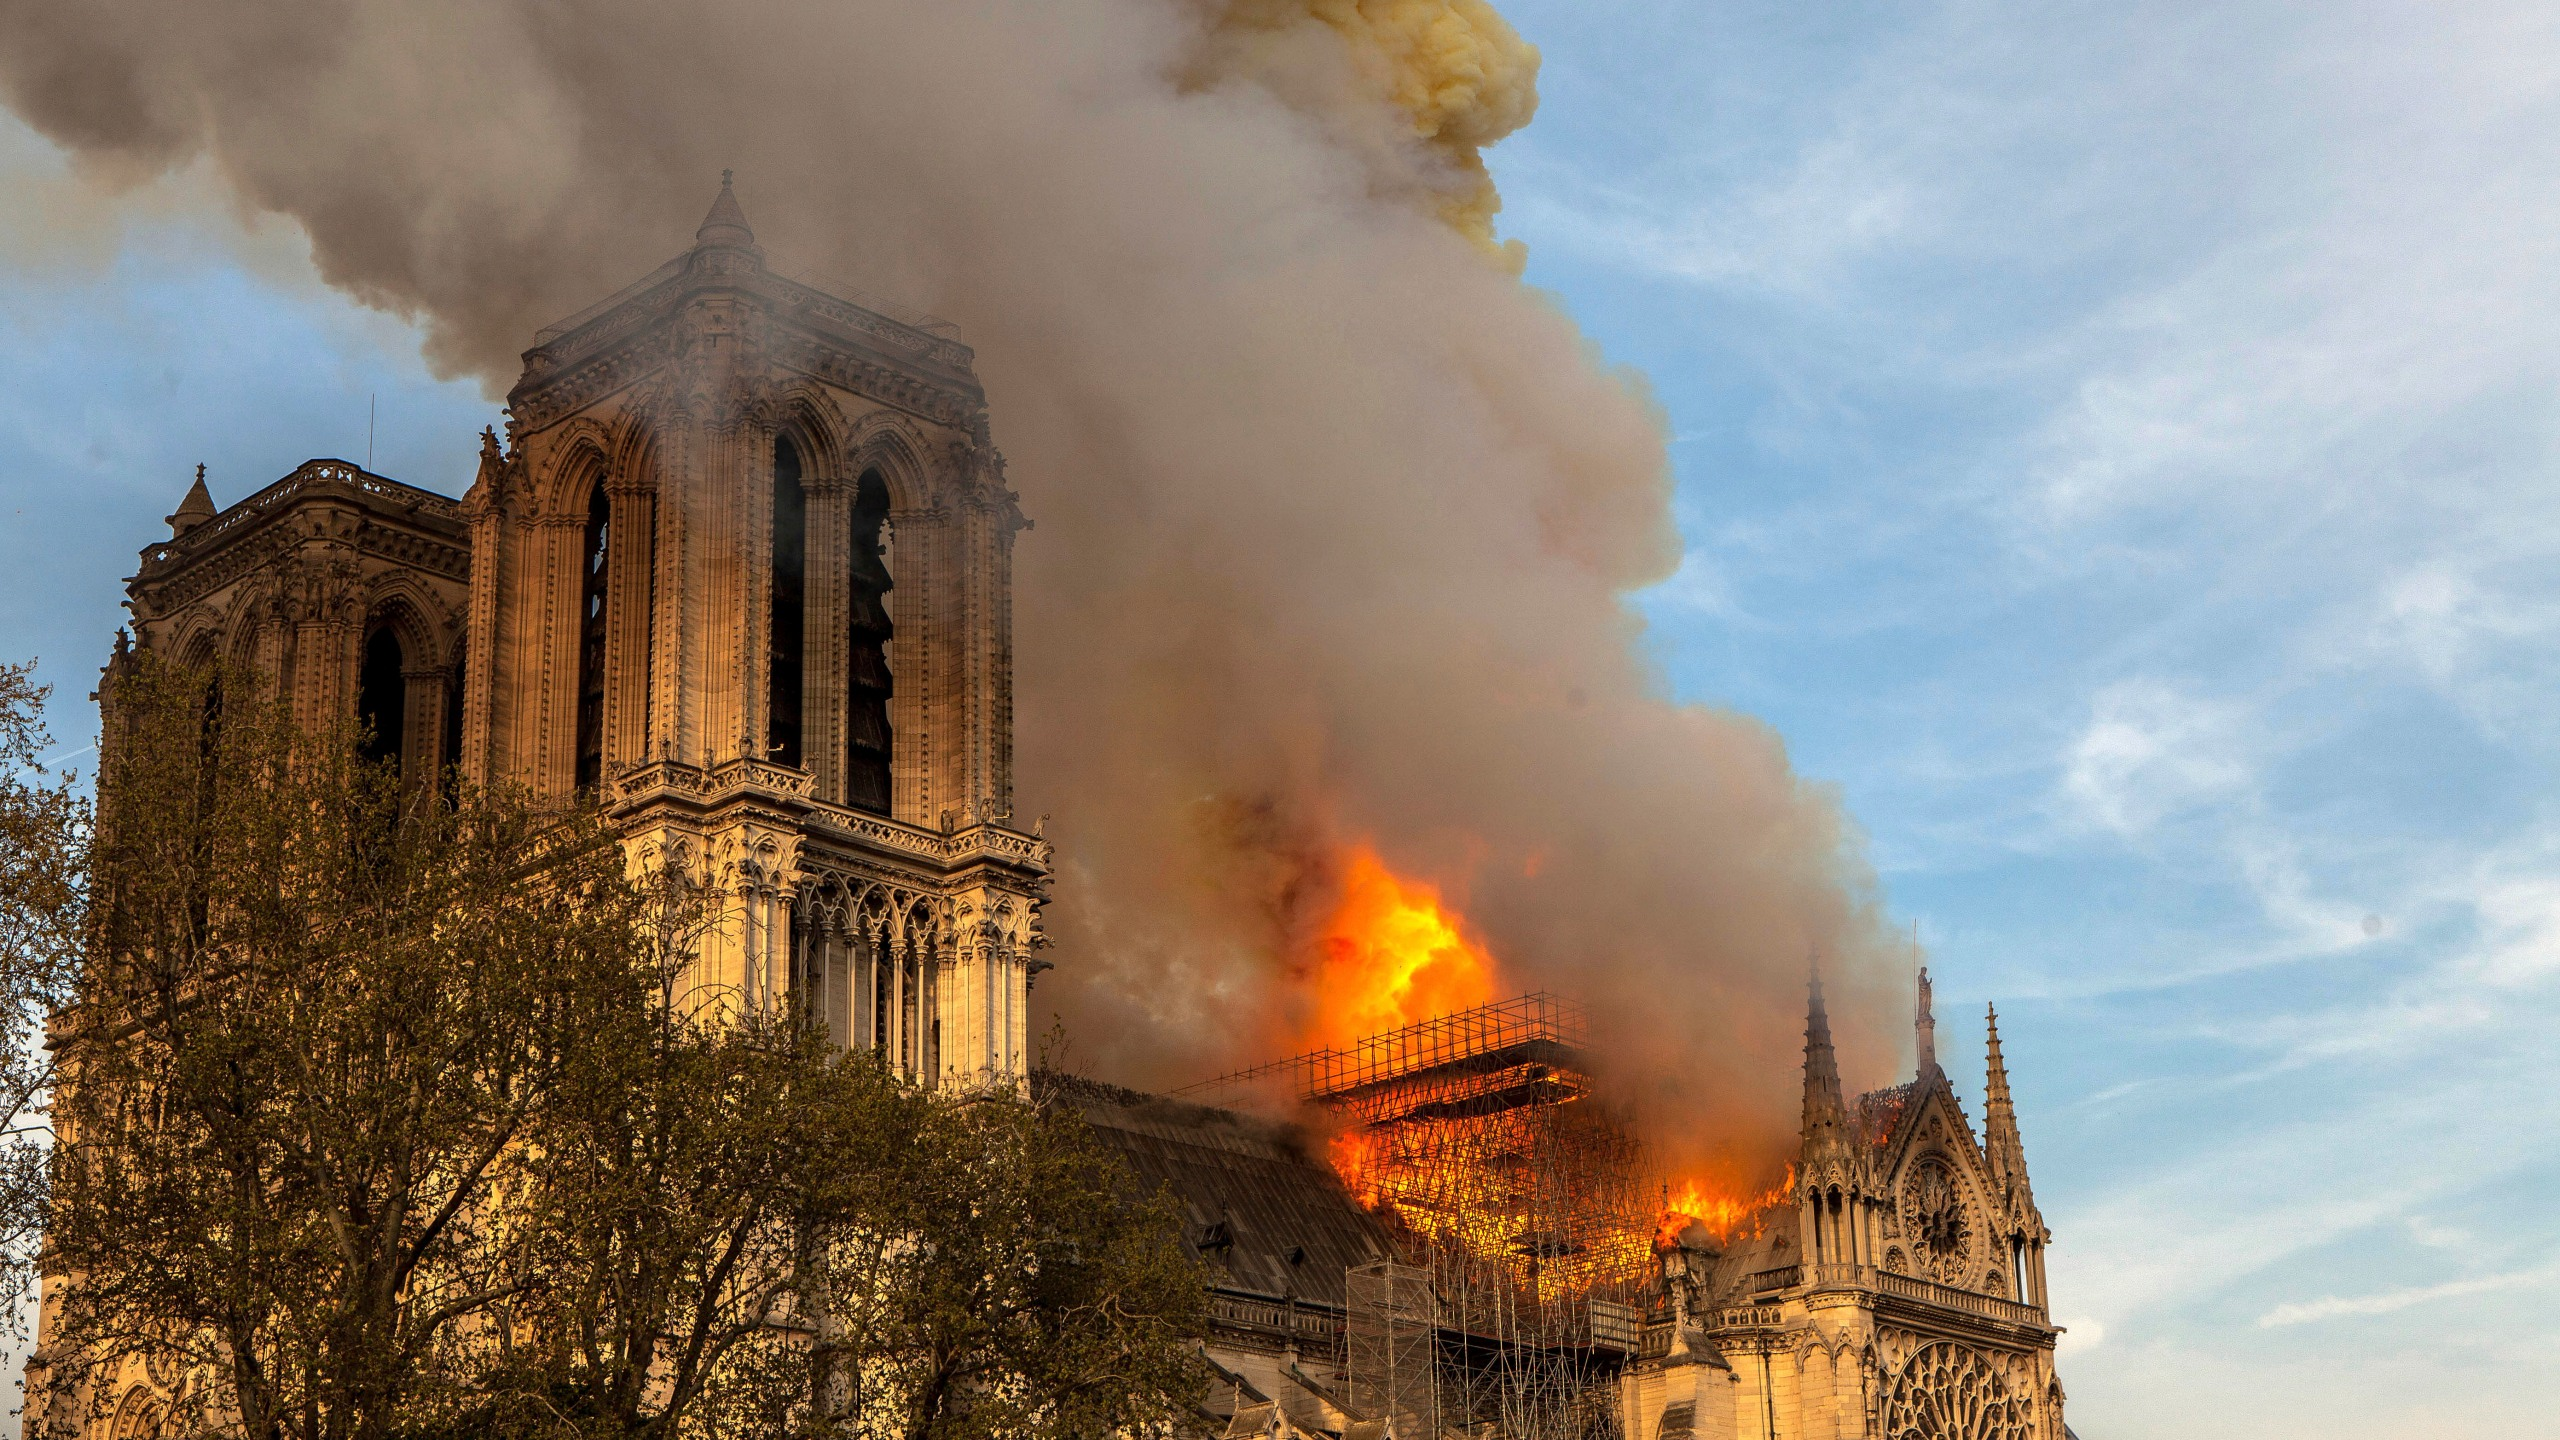 France_Notre_Dame_Fire_47253-159532.jpg54627123